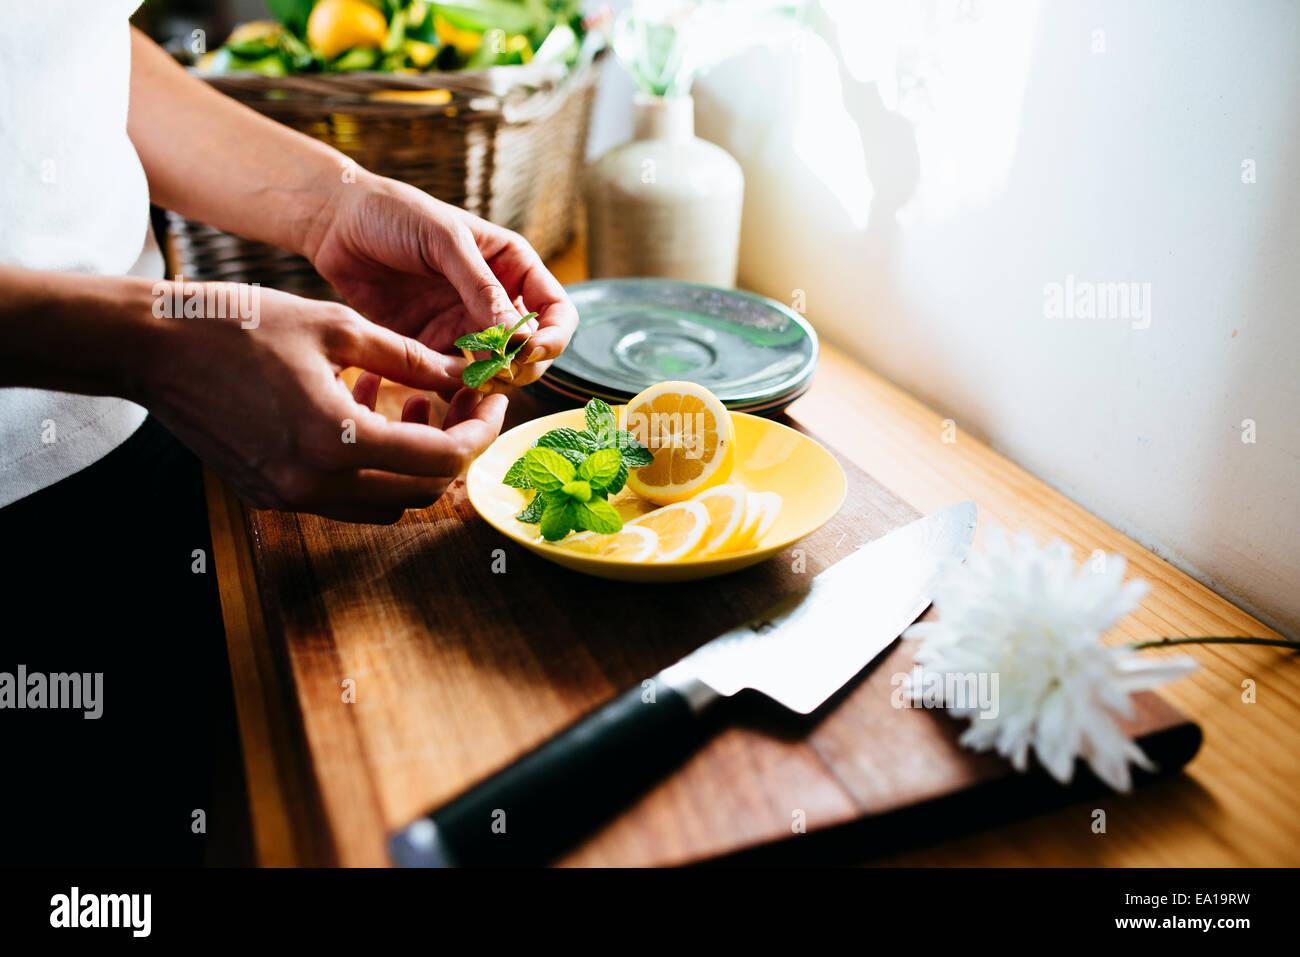 Woman preparing lemon and mint - Stock Image